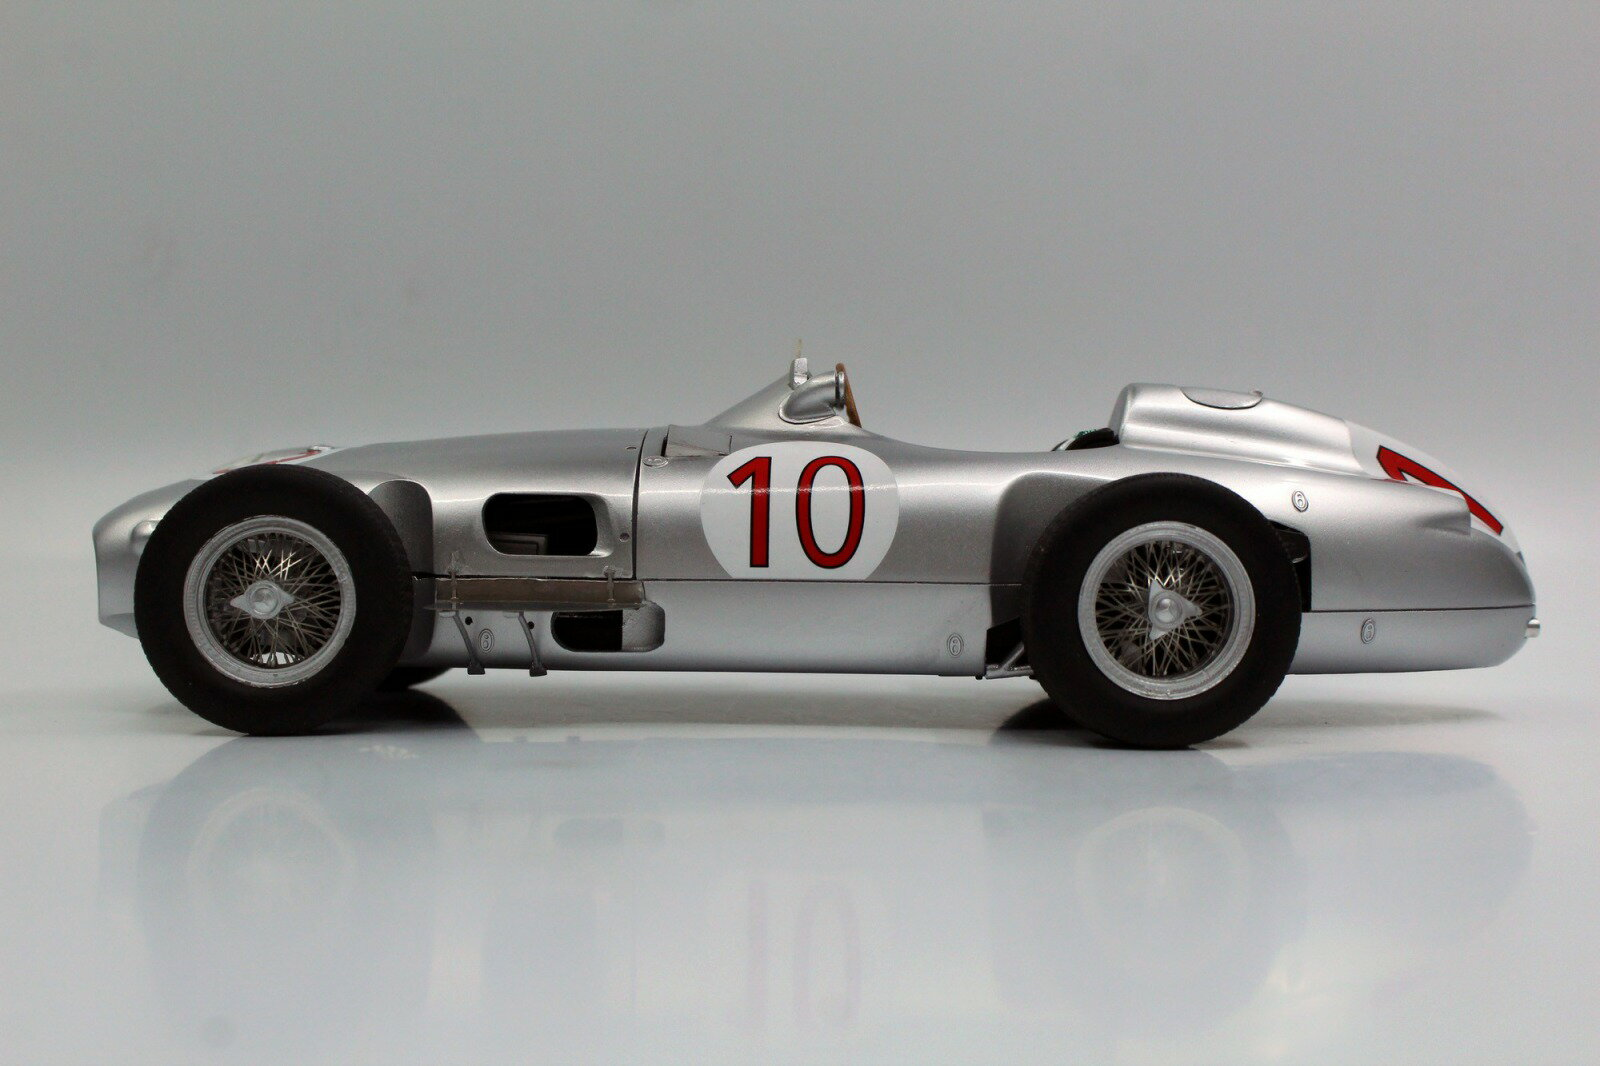 GP Replicas 1/18 ミニカー レジン プロポーションモデル1955年ベルギーGP優勝モデル メルセデスベンツ F1 W196 No.10 J.M.Fangio MERCEDES BENZ - F1 W196 N 10 WINNER BELGIAN GP JUAN MANUEL FANGIO 1955 WORLD CHAMPION 1:18 GP Replicas